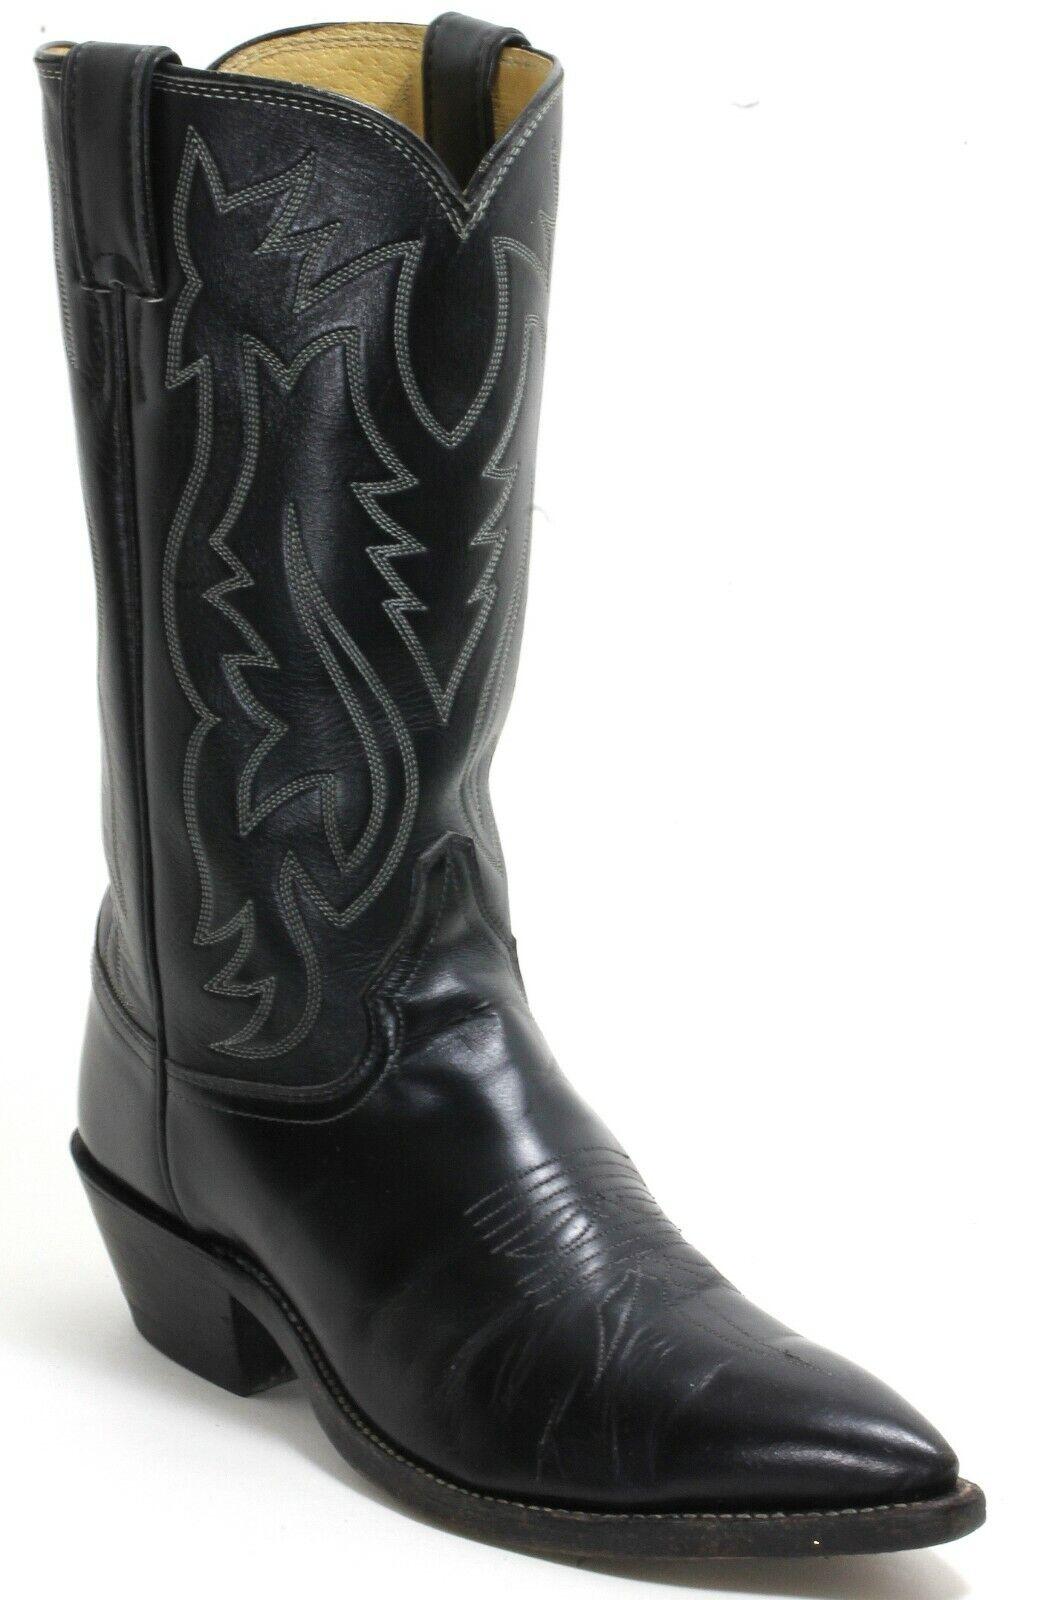 Westernstiefel Cowboystiefel Catalan Style Line Dance Justin P2481 39,5